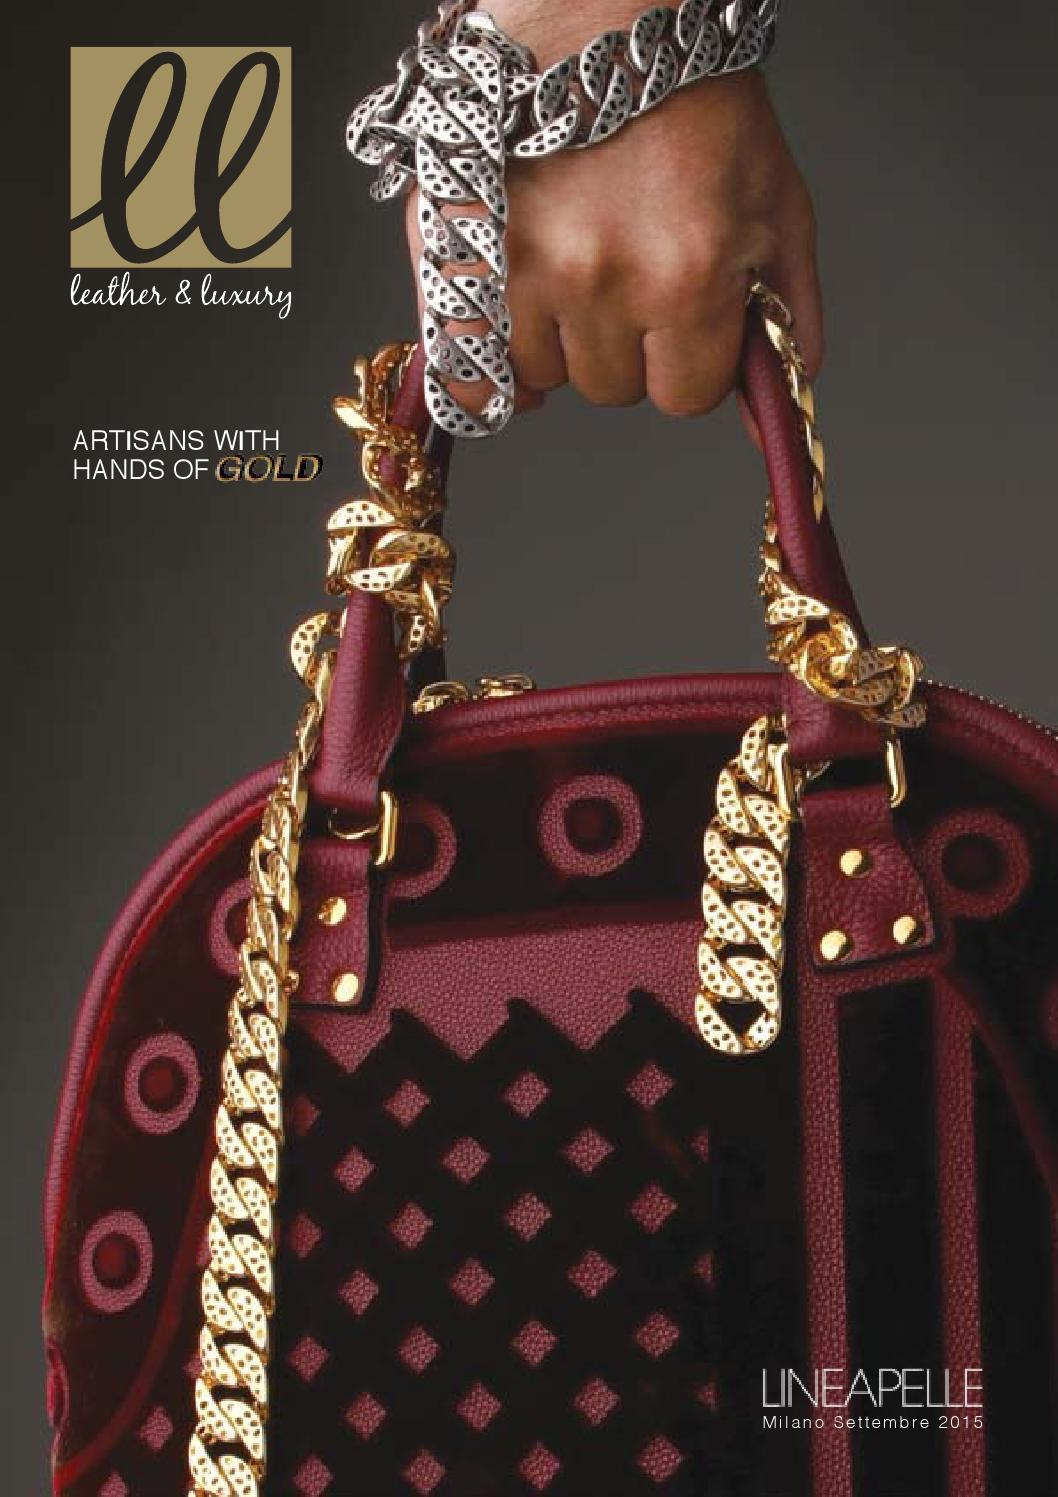 dc522f428f Leather & Luxury by MGA Comunicazione - issuu